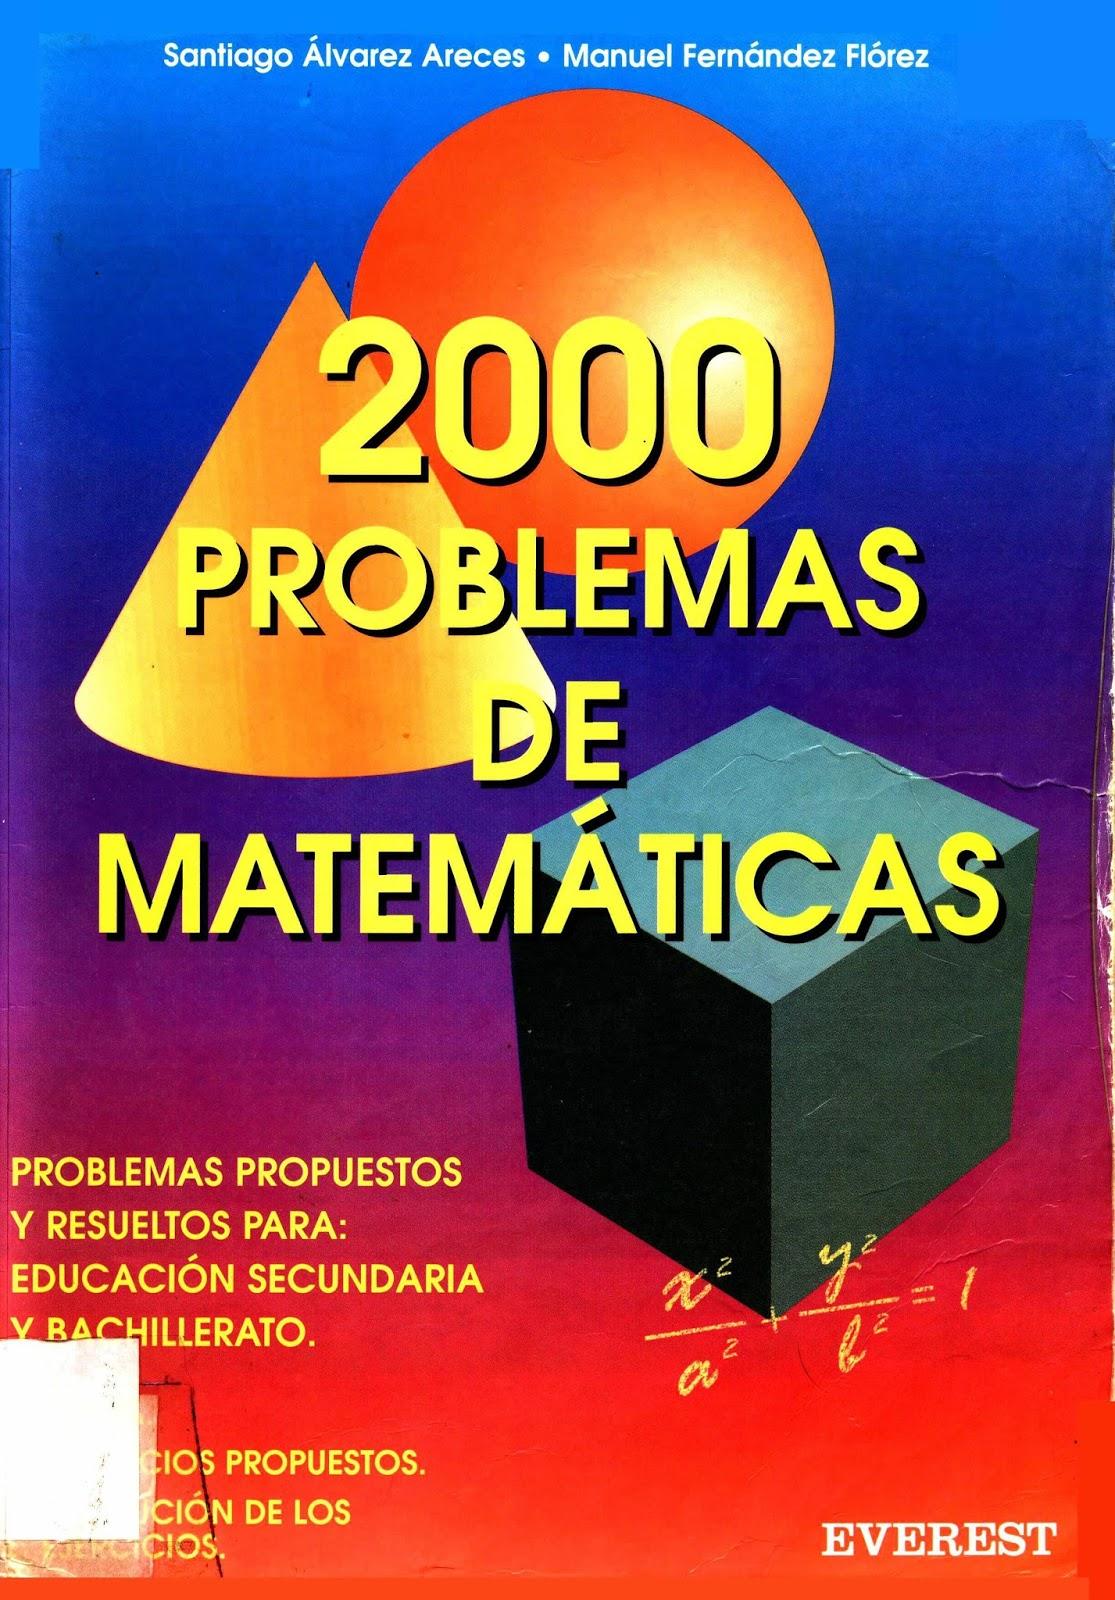 2000 Problemas de matemáticas – Santiago Álvarez Areces